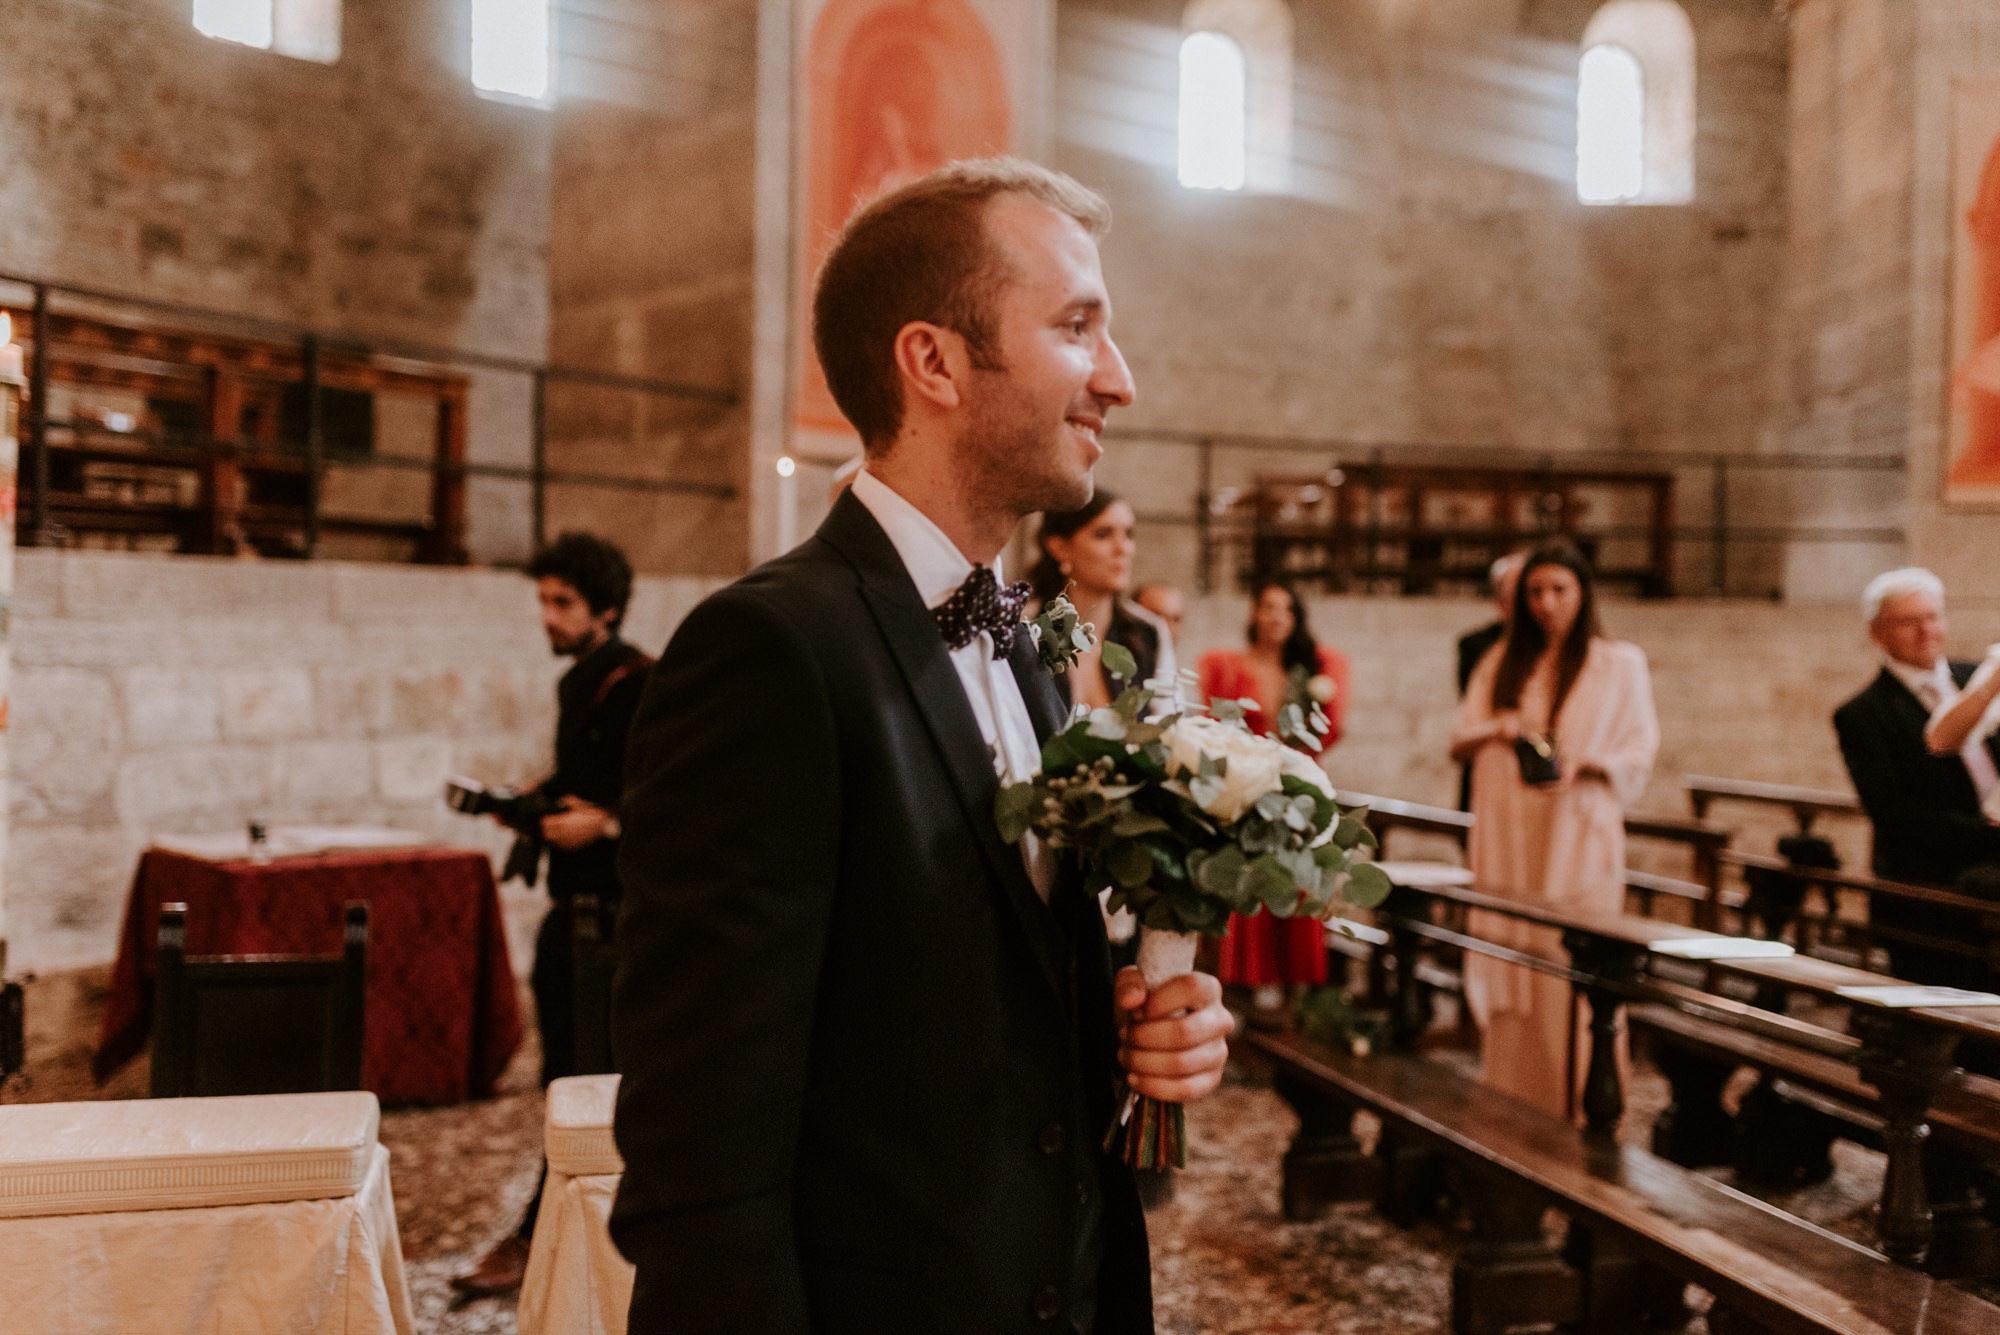 FOTO+PHOTO+BODA+WEDDING+ITALIA+ITALY+MAURICIO+GARAY+MAURICIOGARAY+WEDDINPHOTOGRAPHER+FOTOGRAFODEBODA-761.jpg